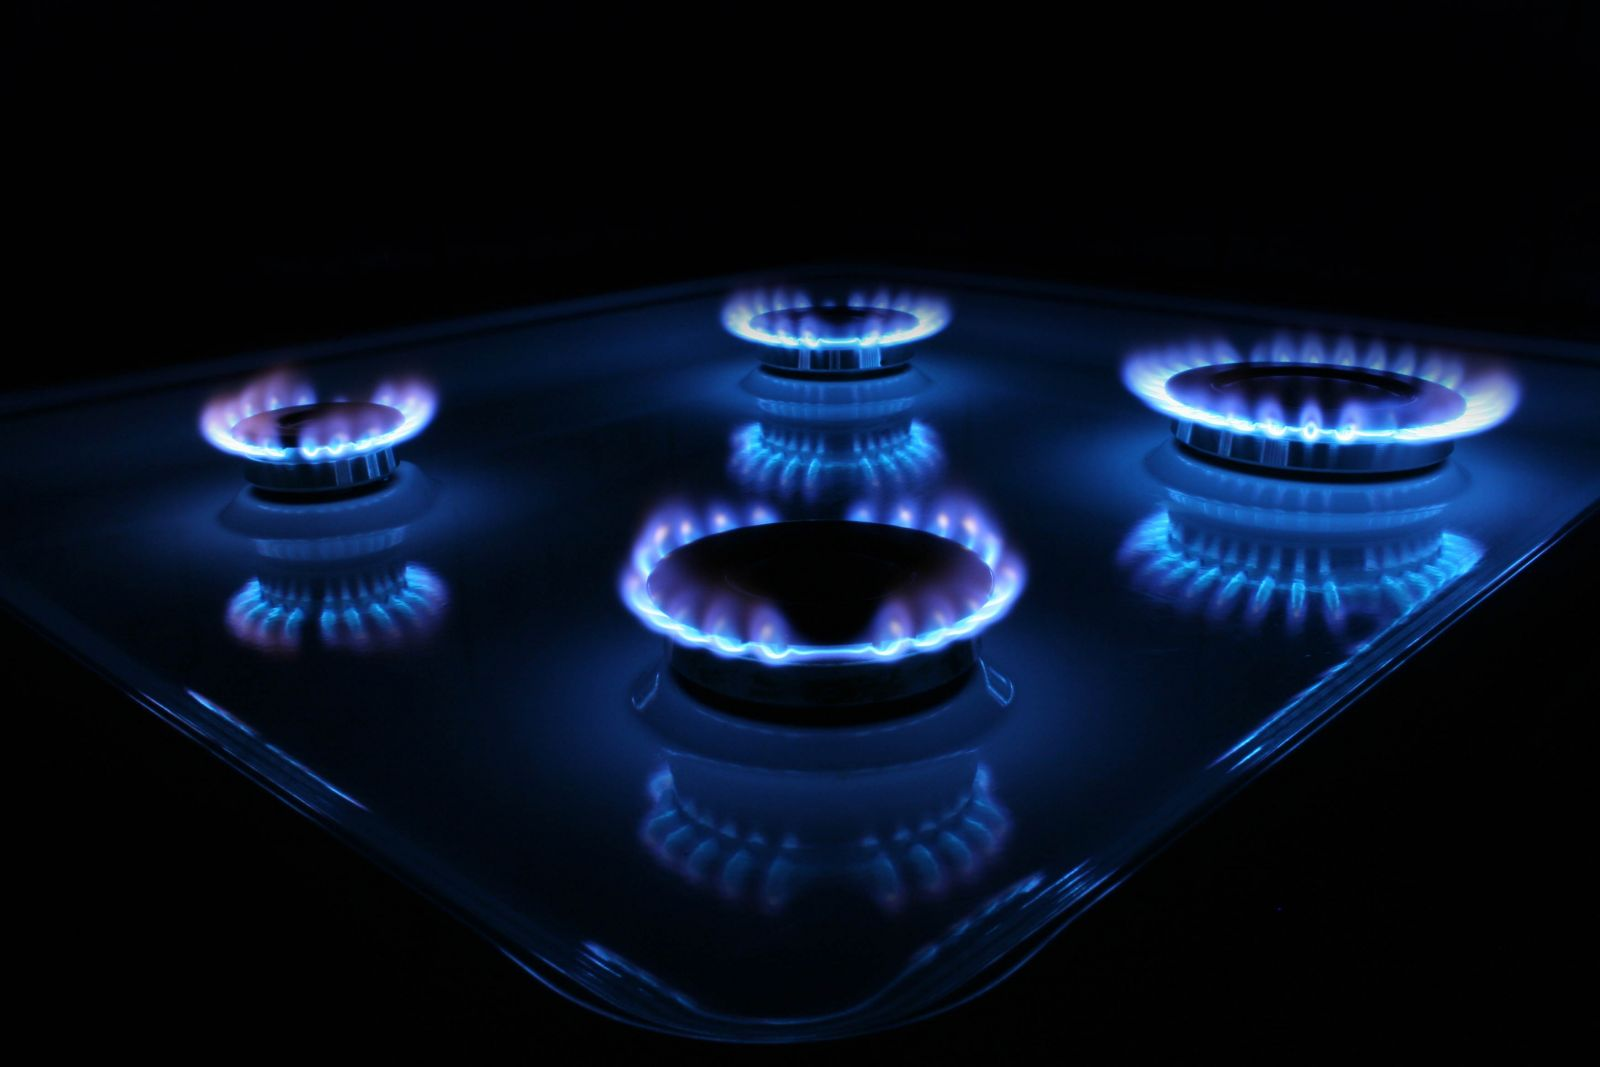 Ситуация с ценой на газ становится тяжелой